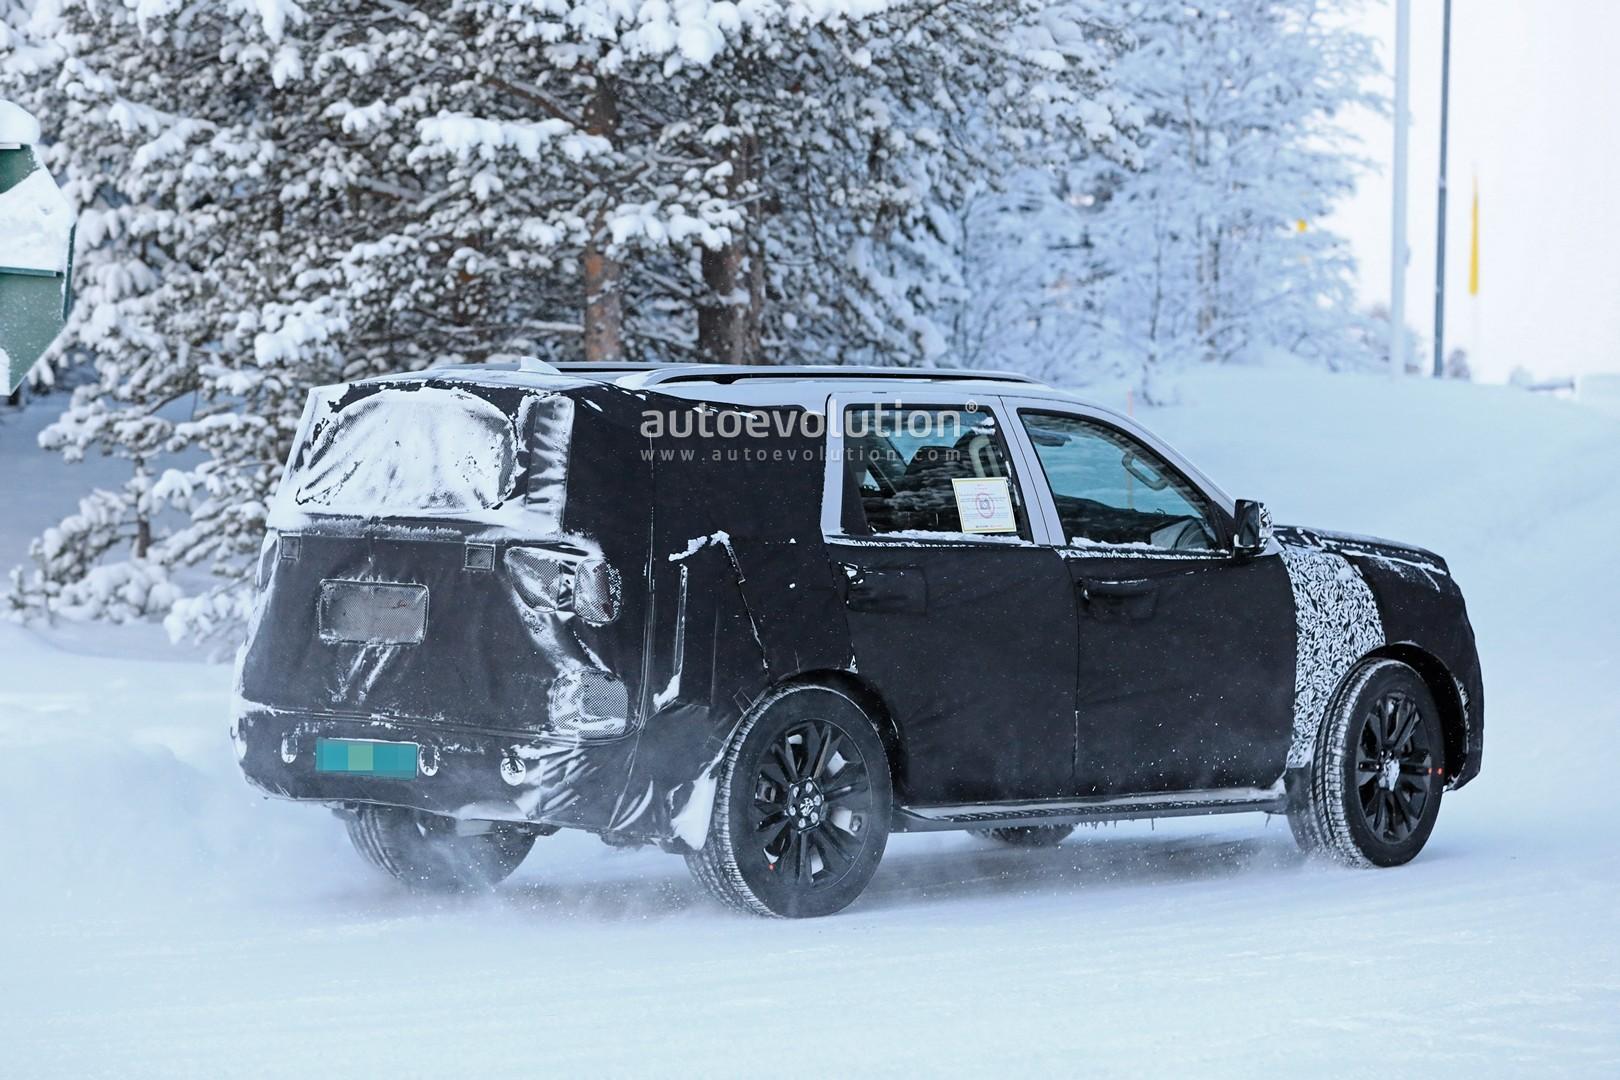 2020 Kia Mohave Borrego Spied Winter Testing Looks Like